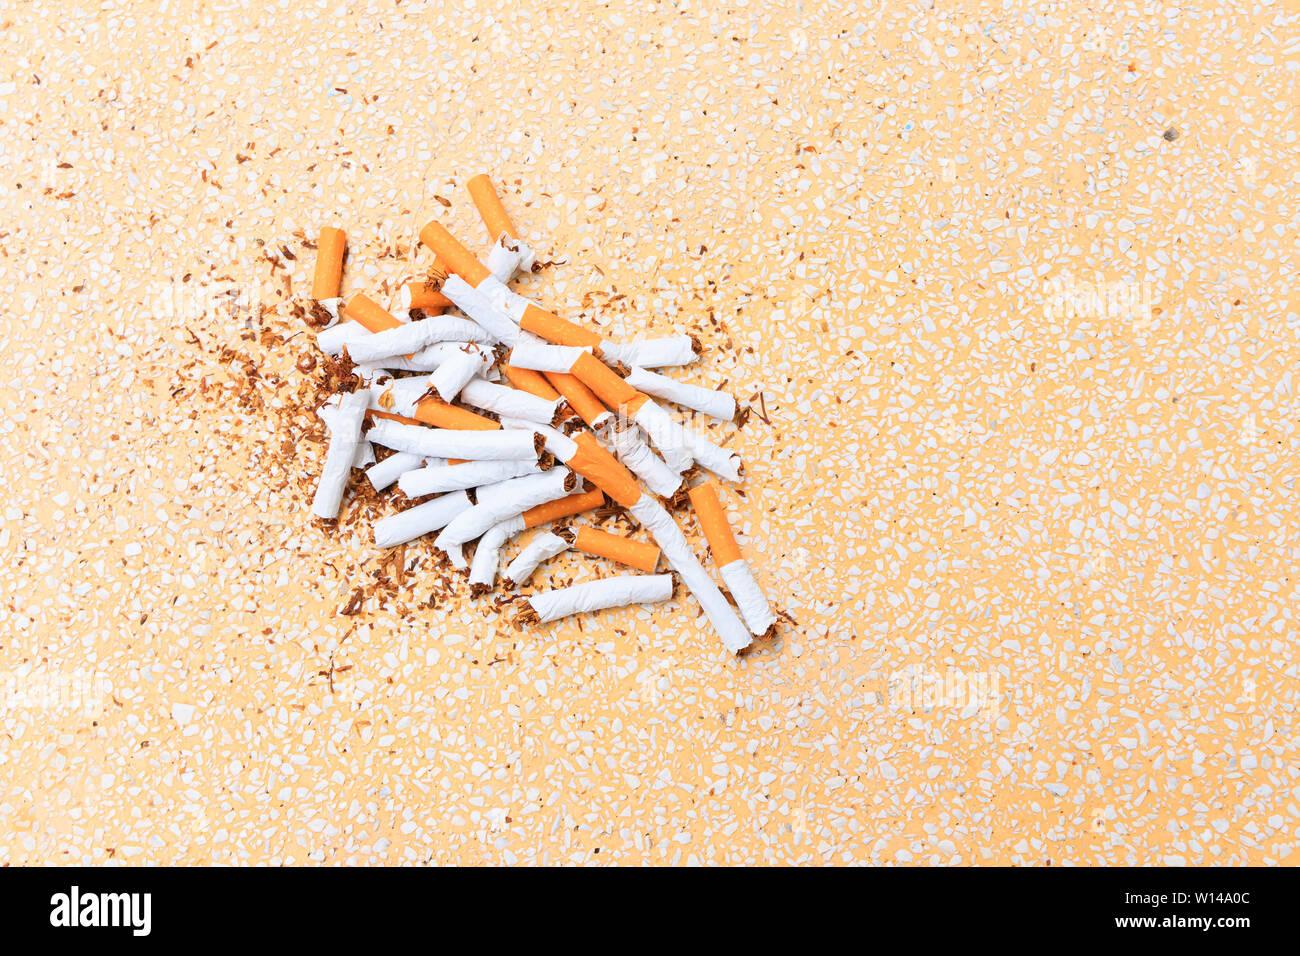 Pile Cigarettes Broken On Table Terrazzo Flooring Yellow